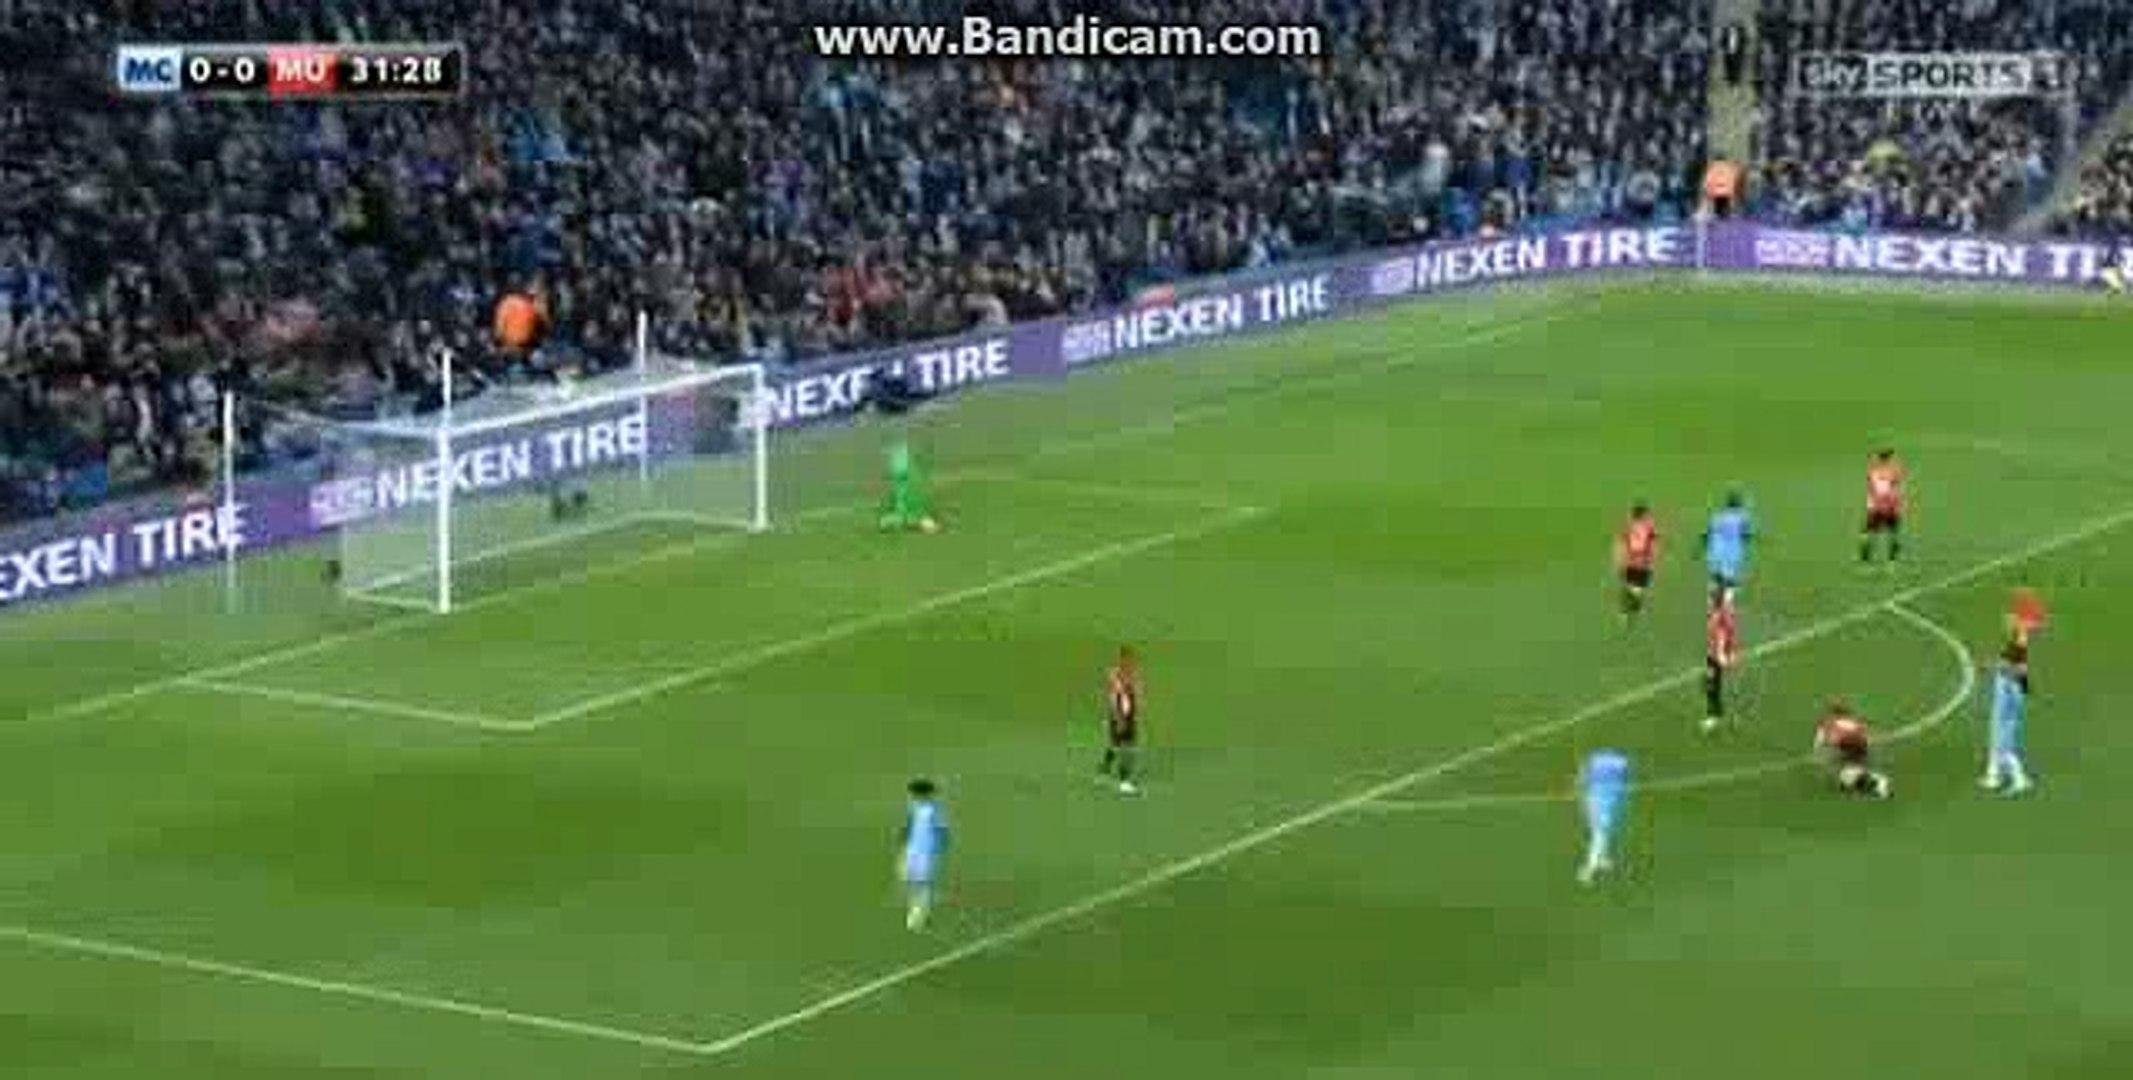 Sergio Aguero Amazing Shot HD - Manchester City Vs Manchester United - 27.04.2017 HD